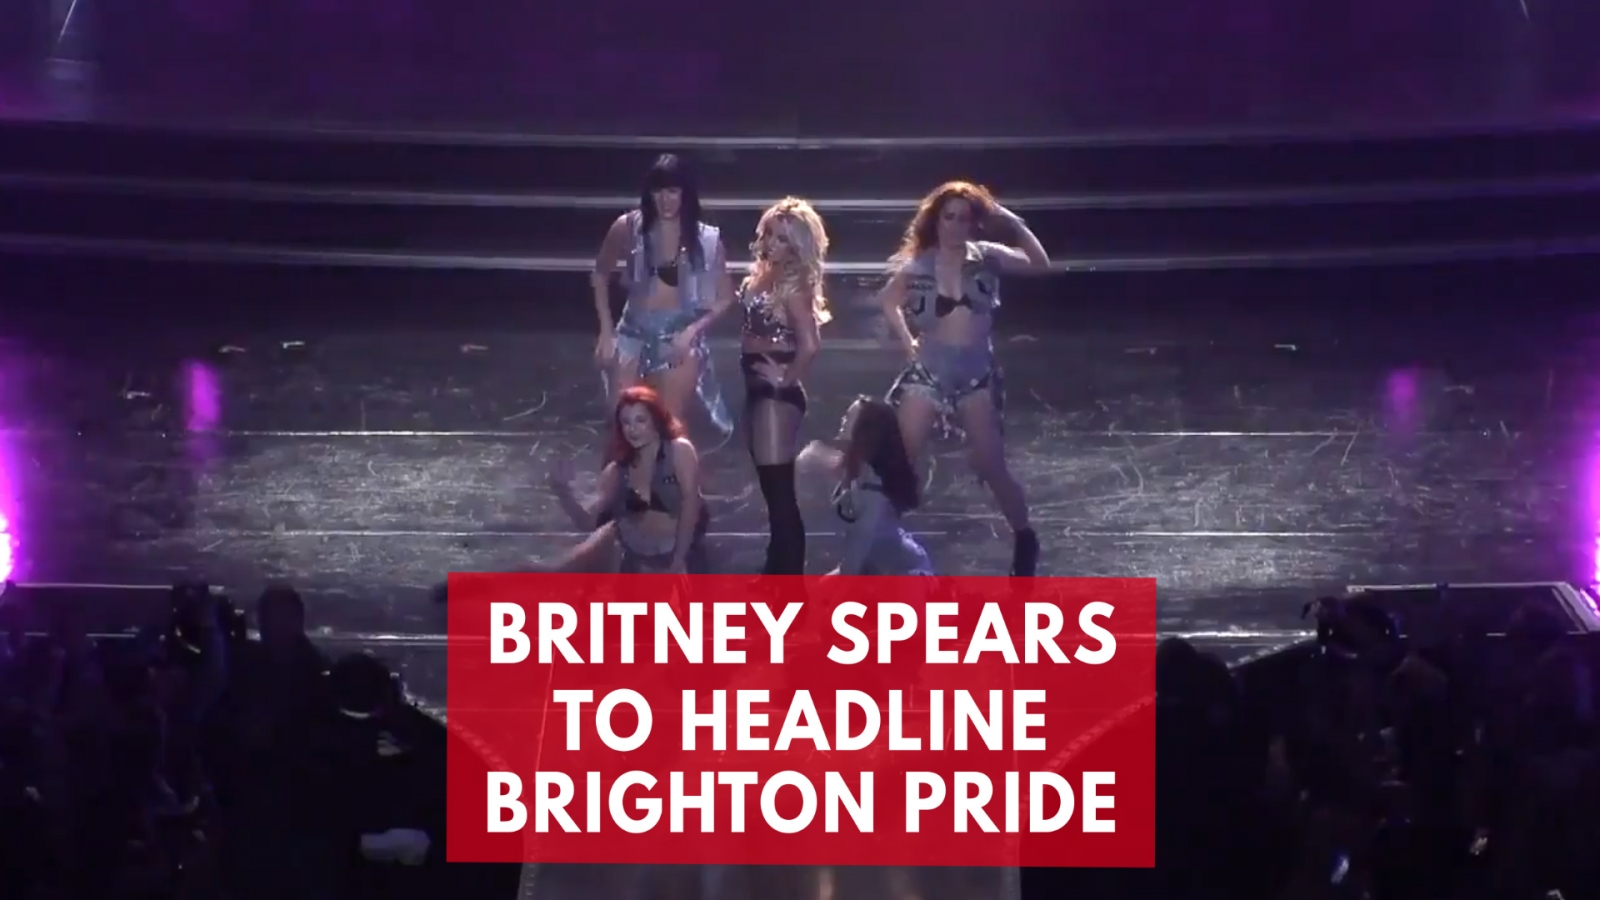 Britney Spears To Headline Brighton Pride During U.K. Tour